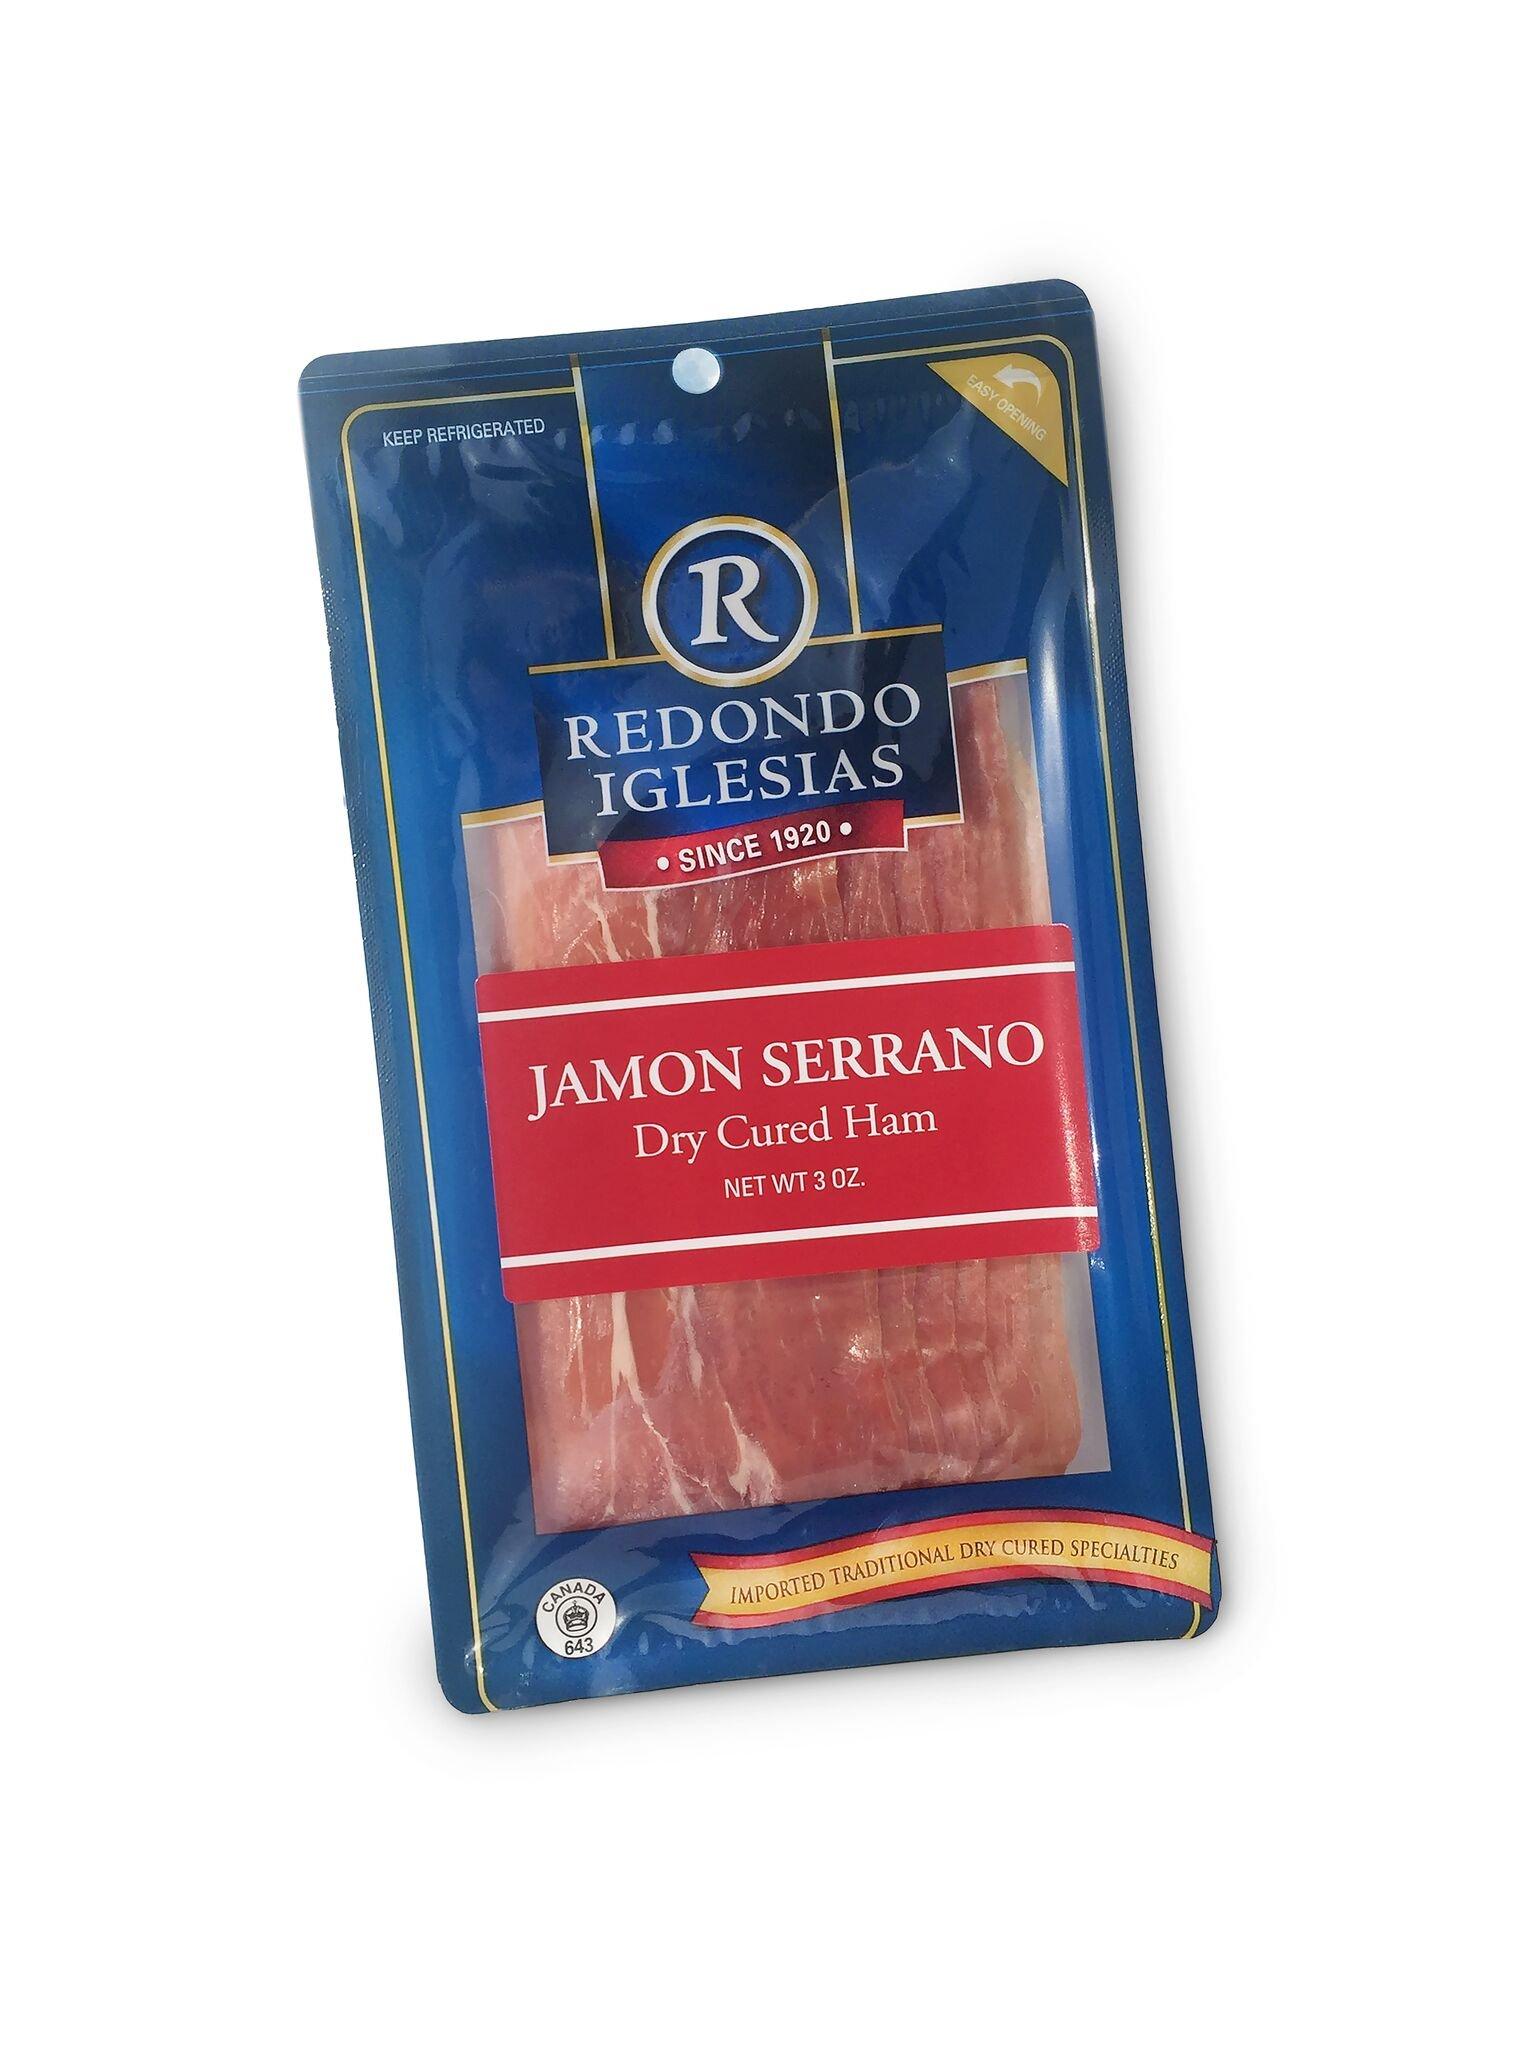 Jamon Serrano Sliced 12 x 3 Oz - 15 months aged dry cured ham by Redondo Iglesias